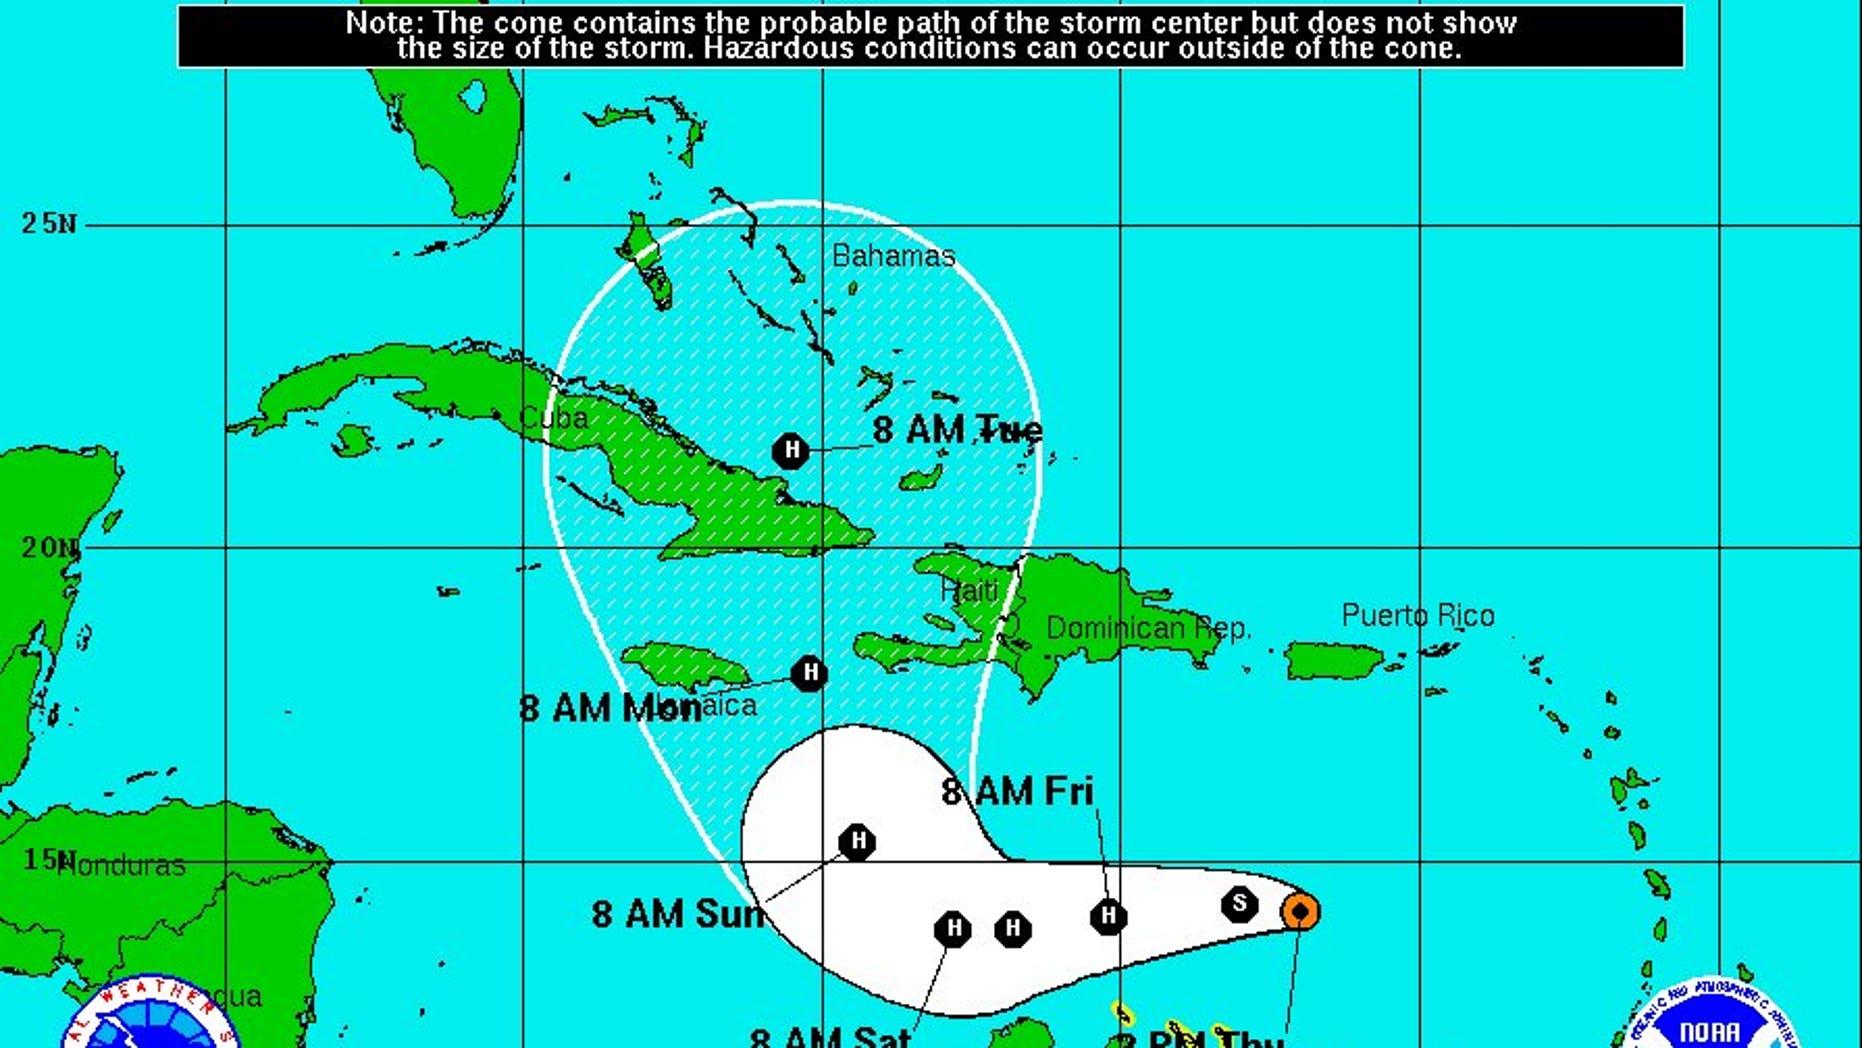 Hurricane Matthew's projected path